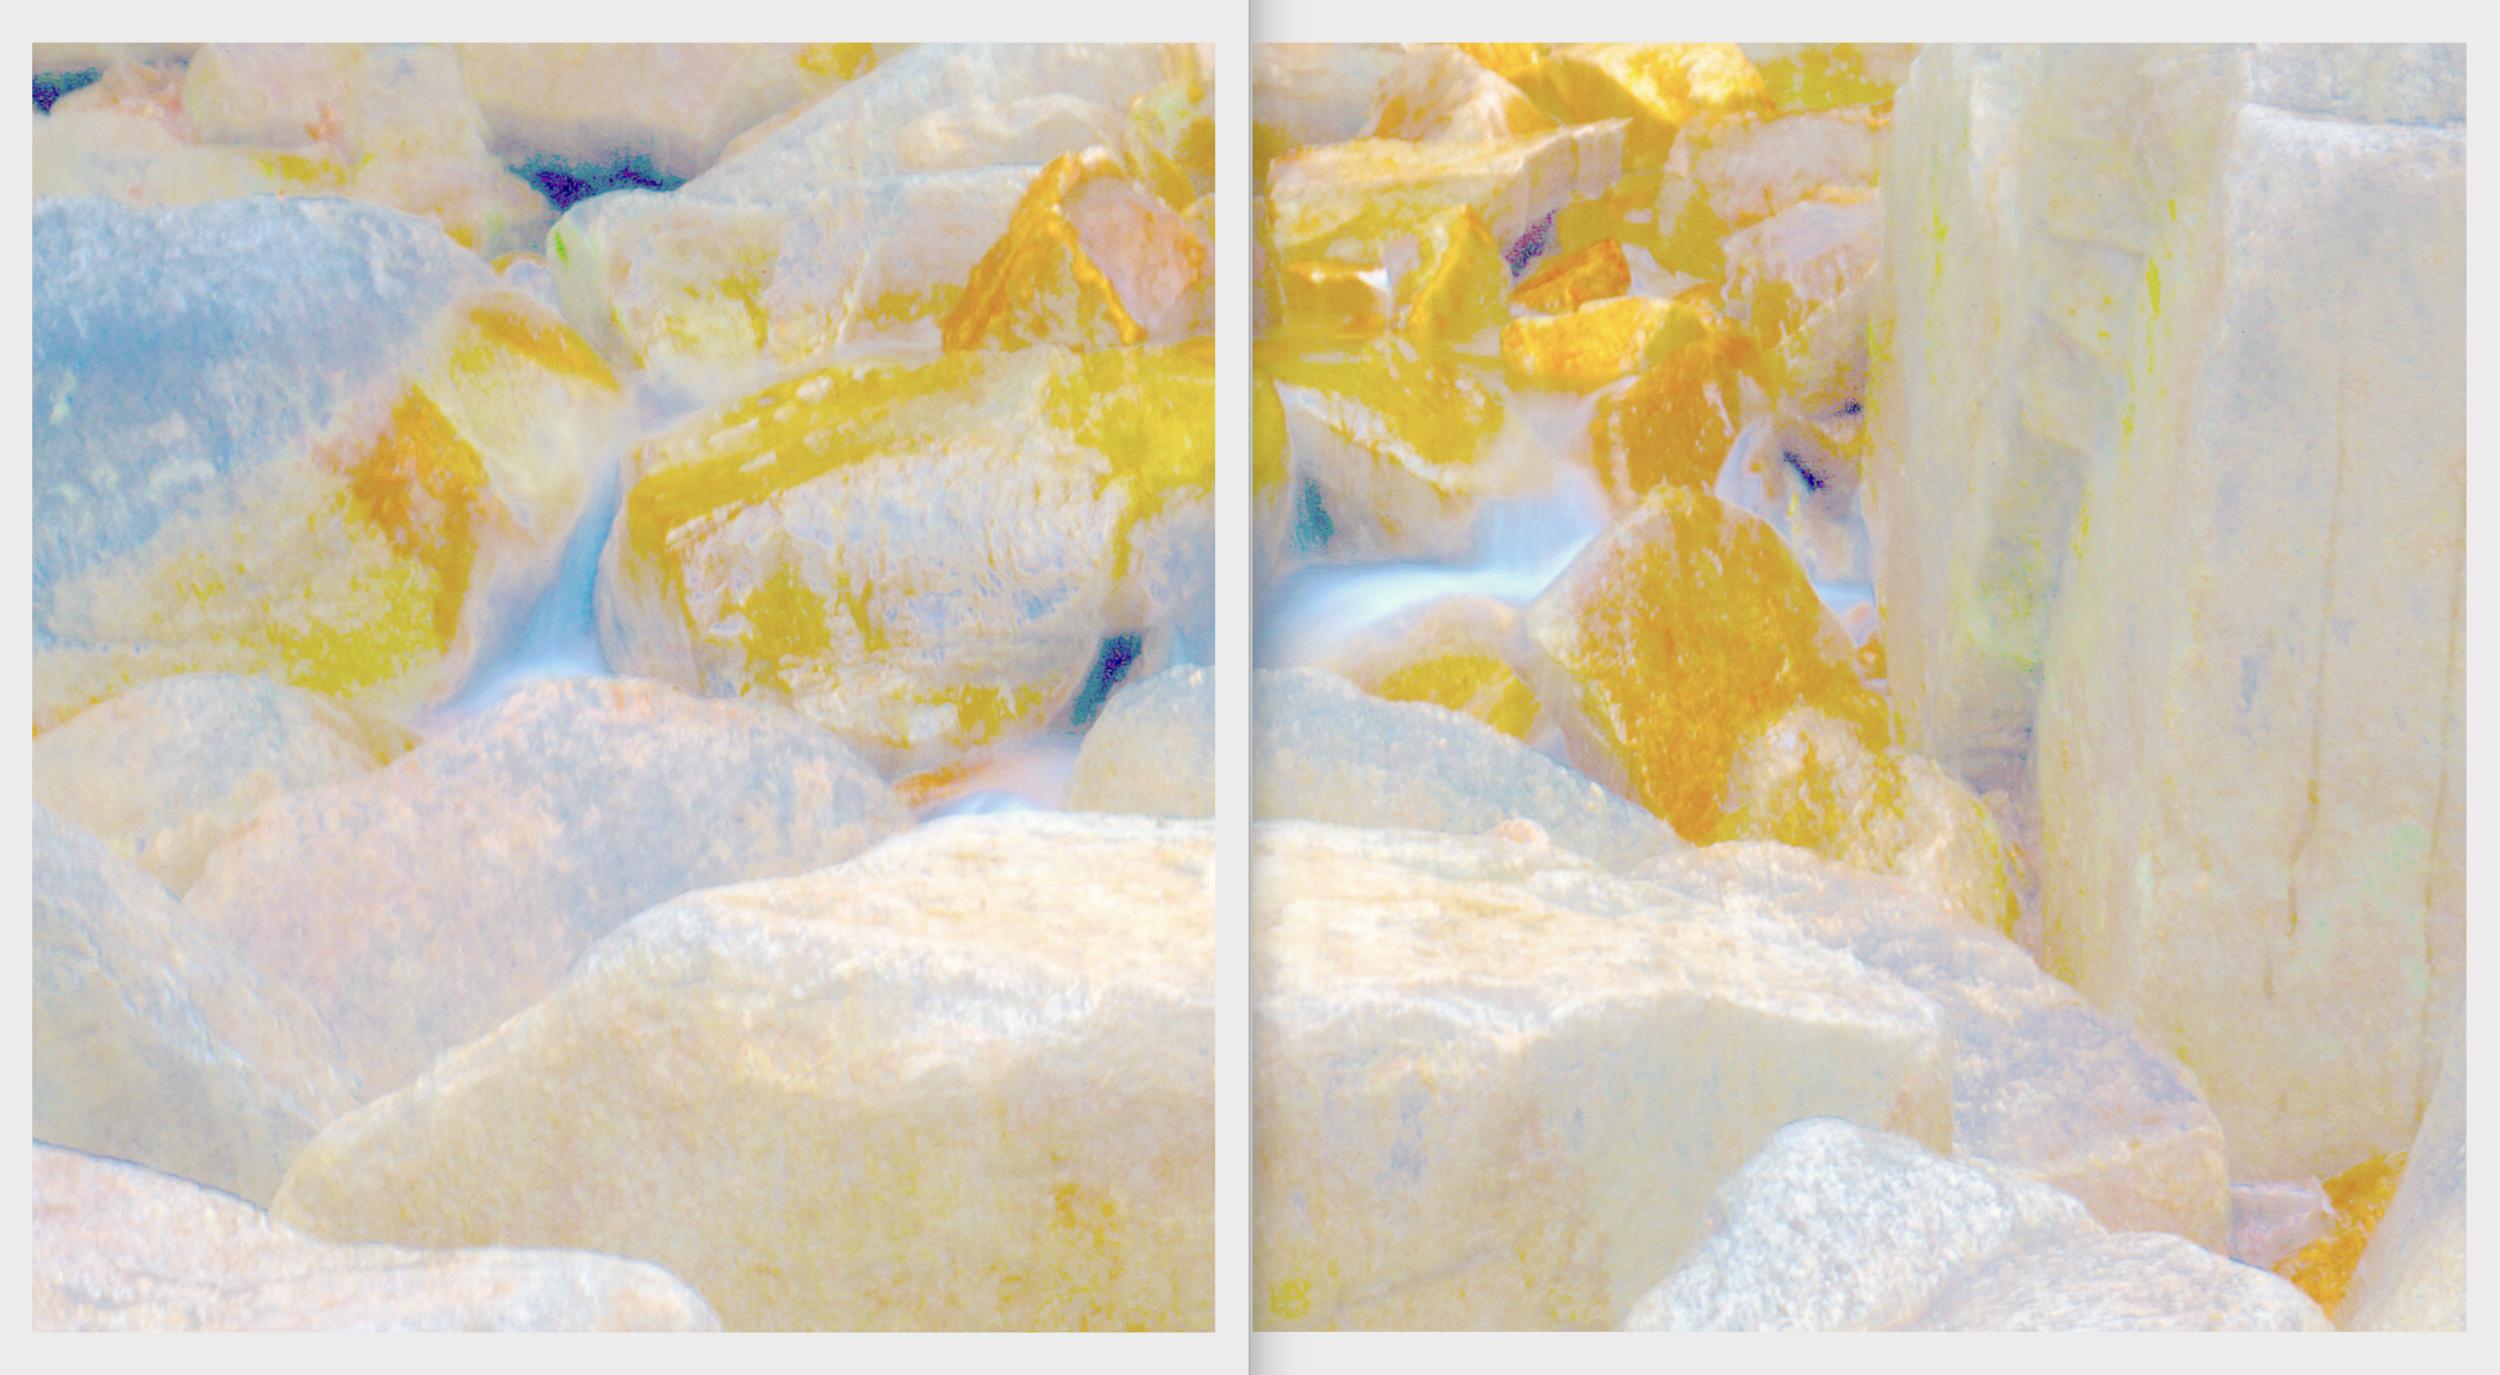 Beyond the Oecumene / Part XXIII (Diptych),  2019 Aquarelle, wax pastels, UV-print on paper 300 x 160 cm (118 x 63 in)